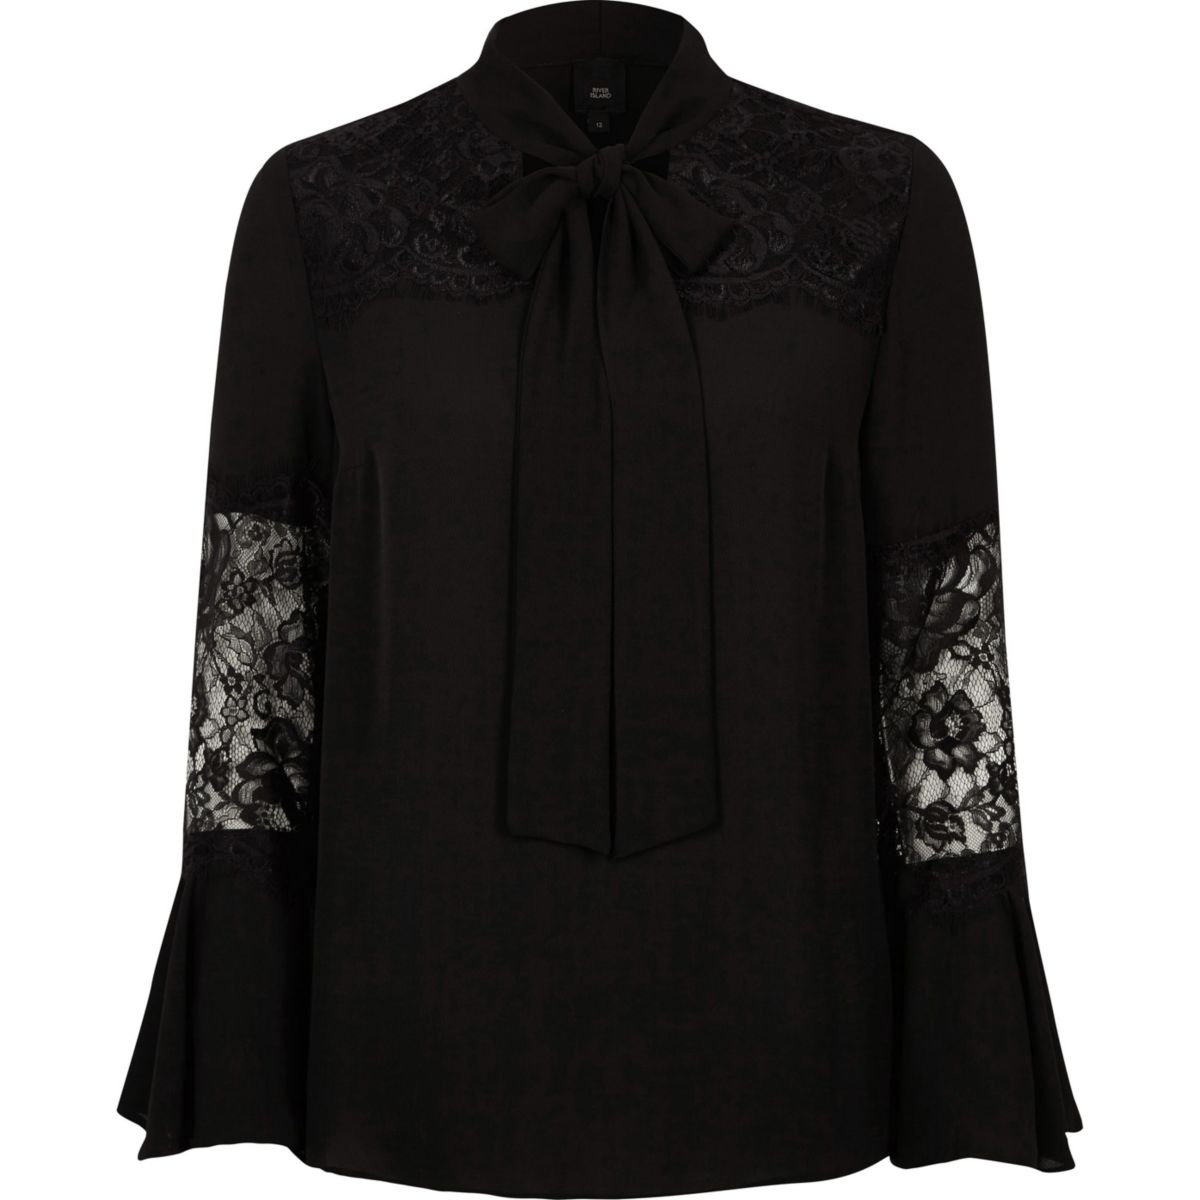 Black lace insert flared sleeve blouse